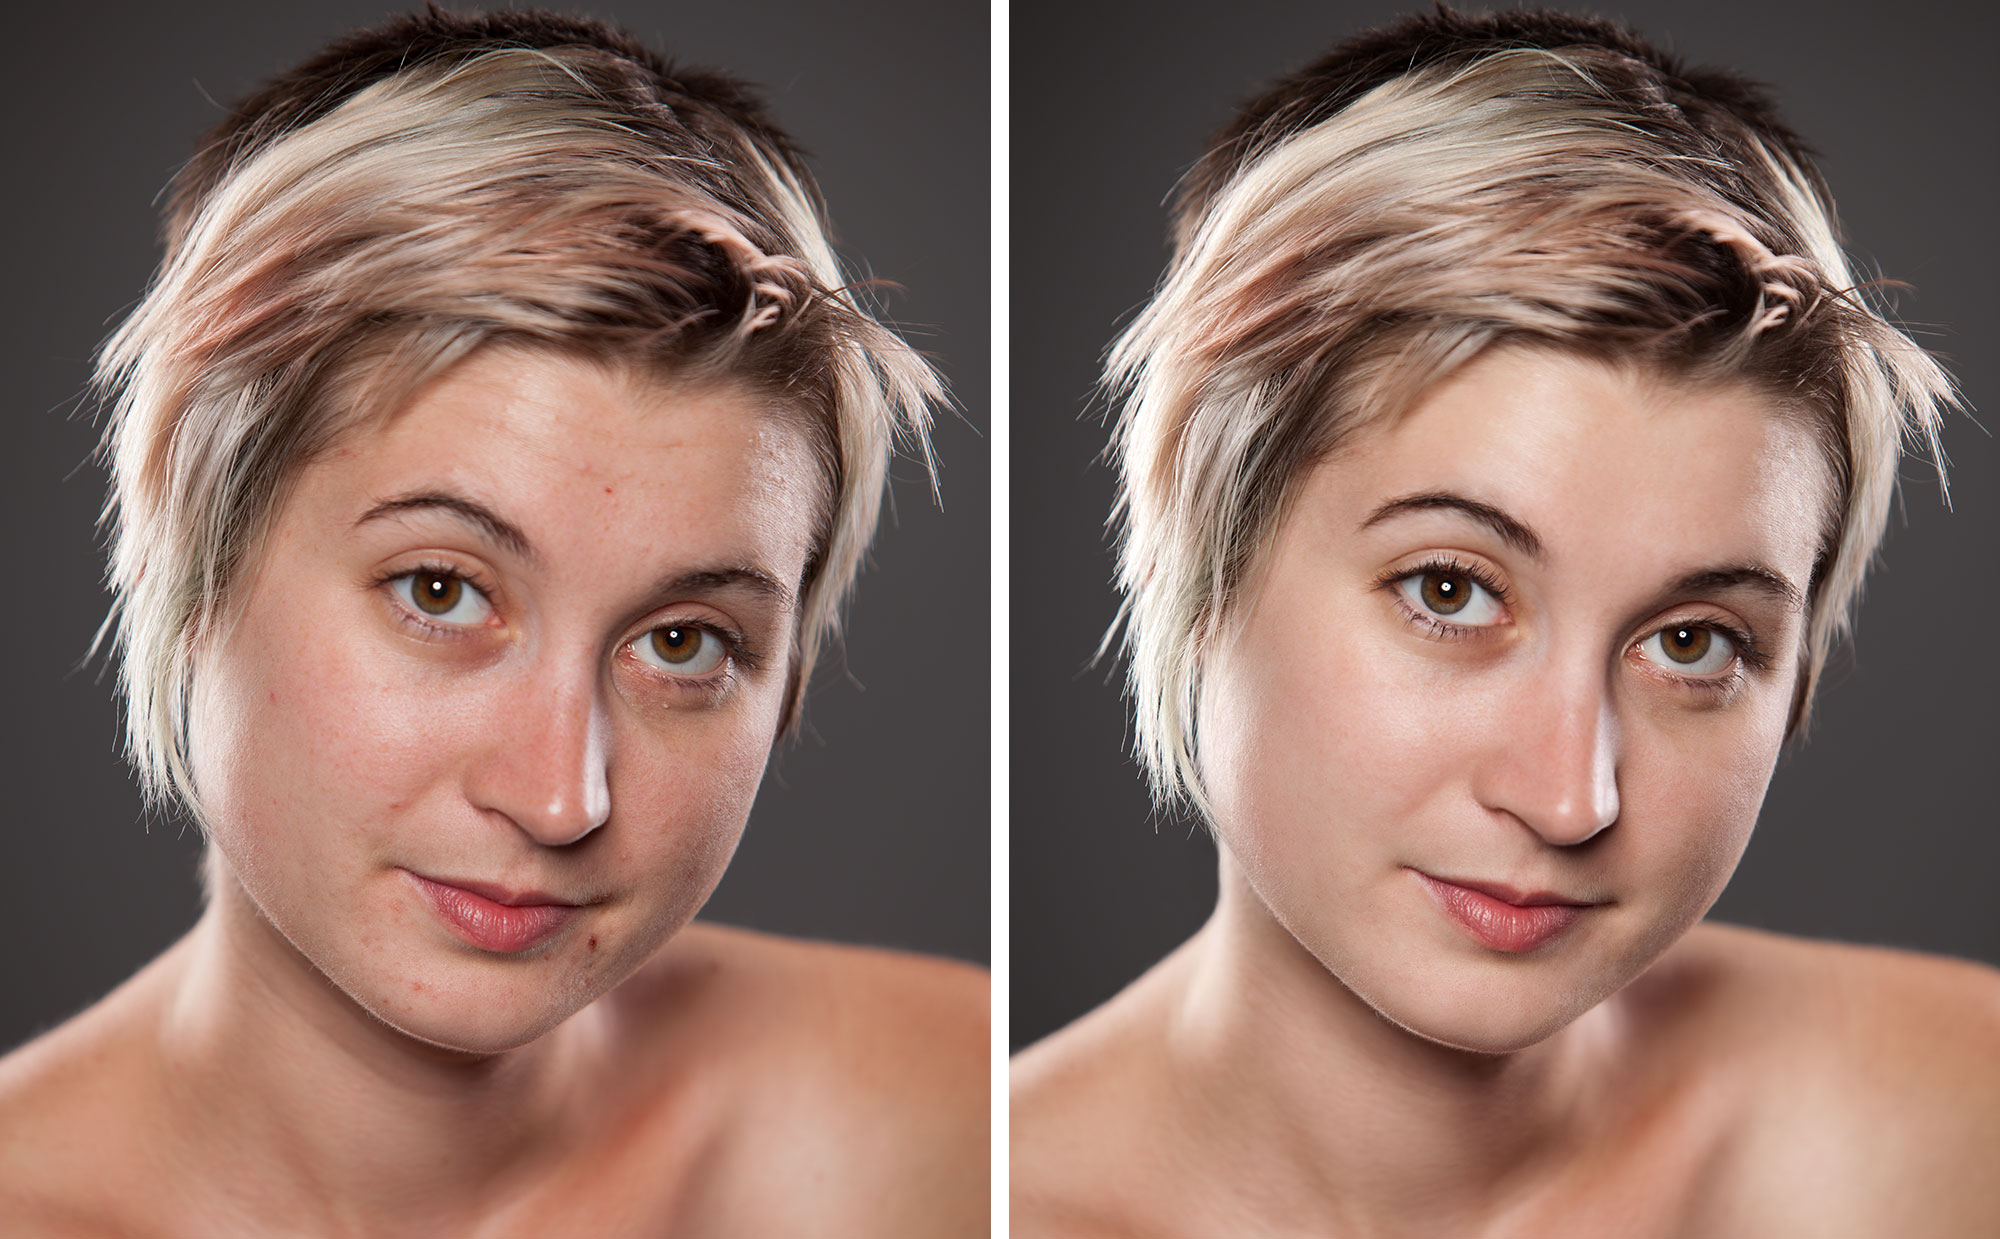 Professional Retouching I: Headshot by Alex Kay